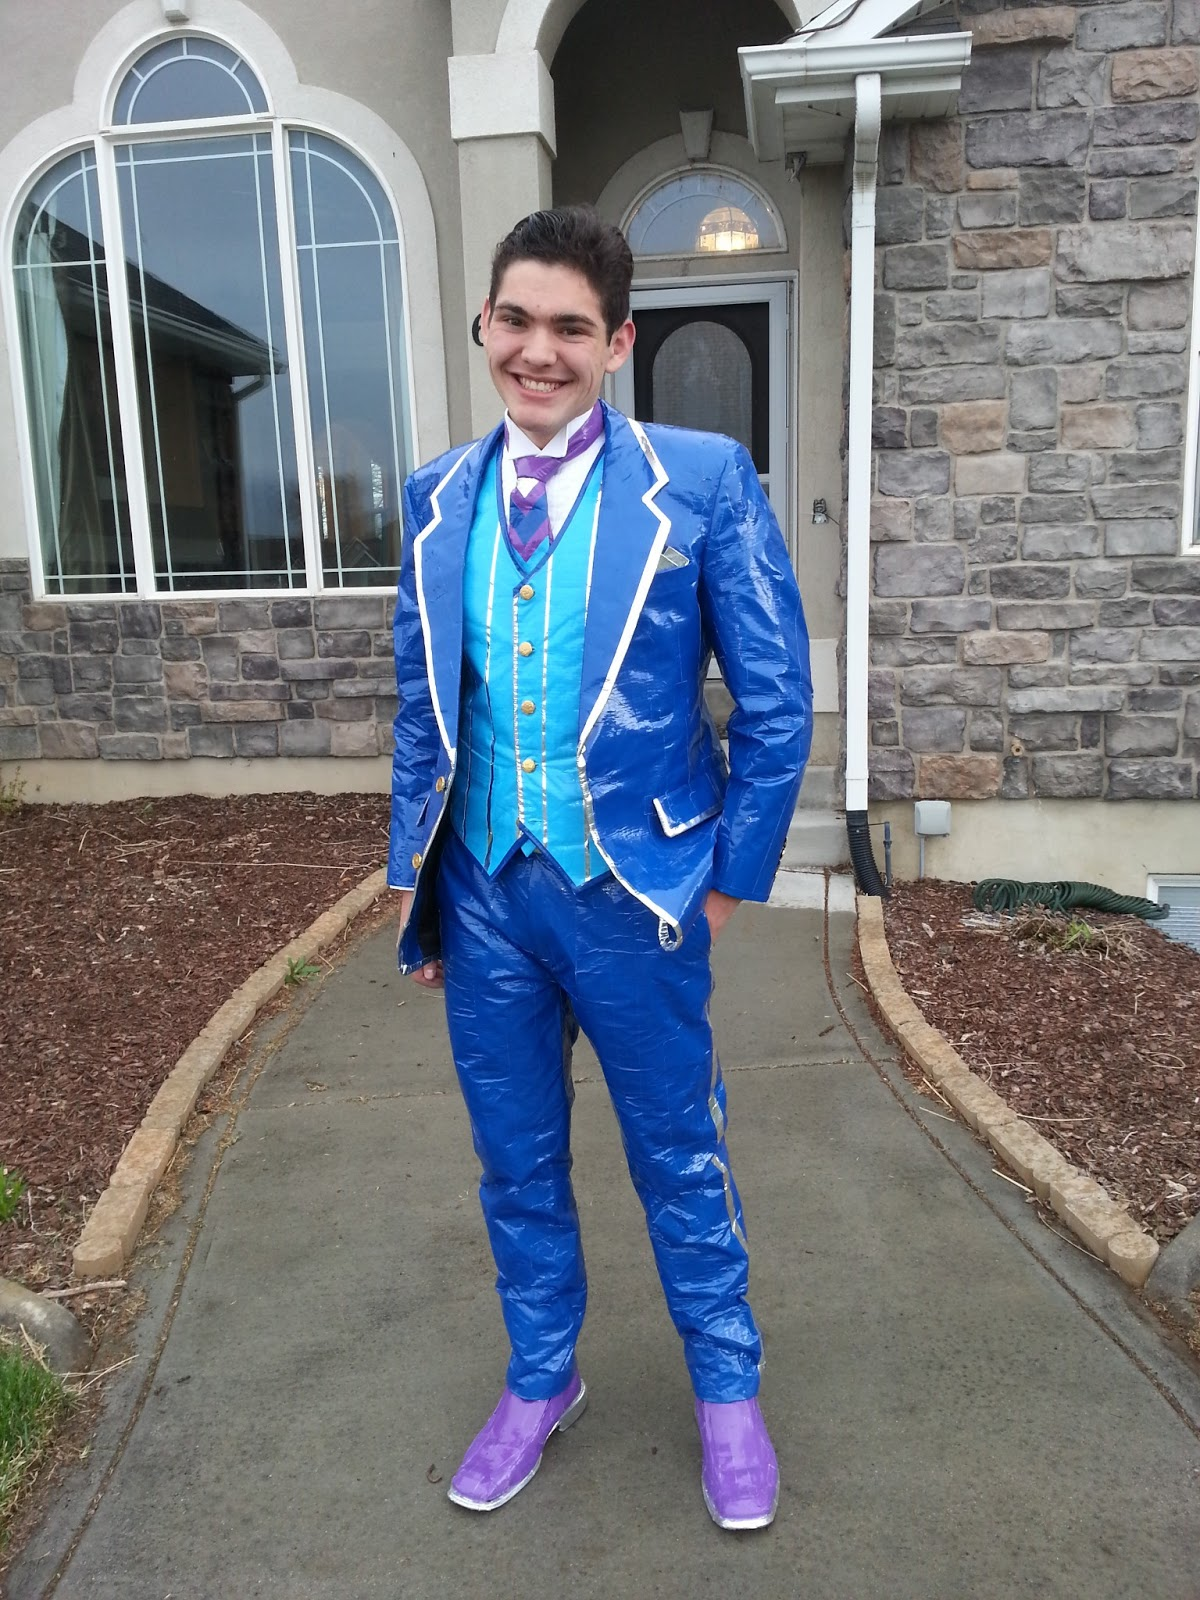 Awesome Prom Tuxedos – fashion dresses